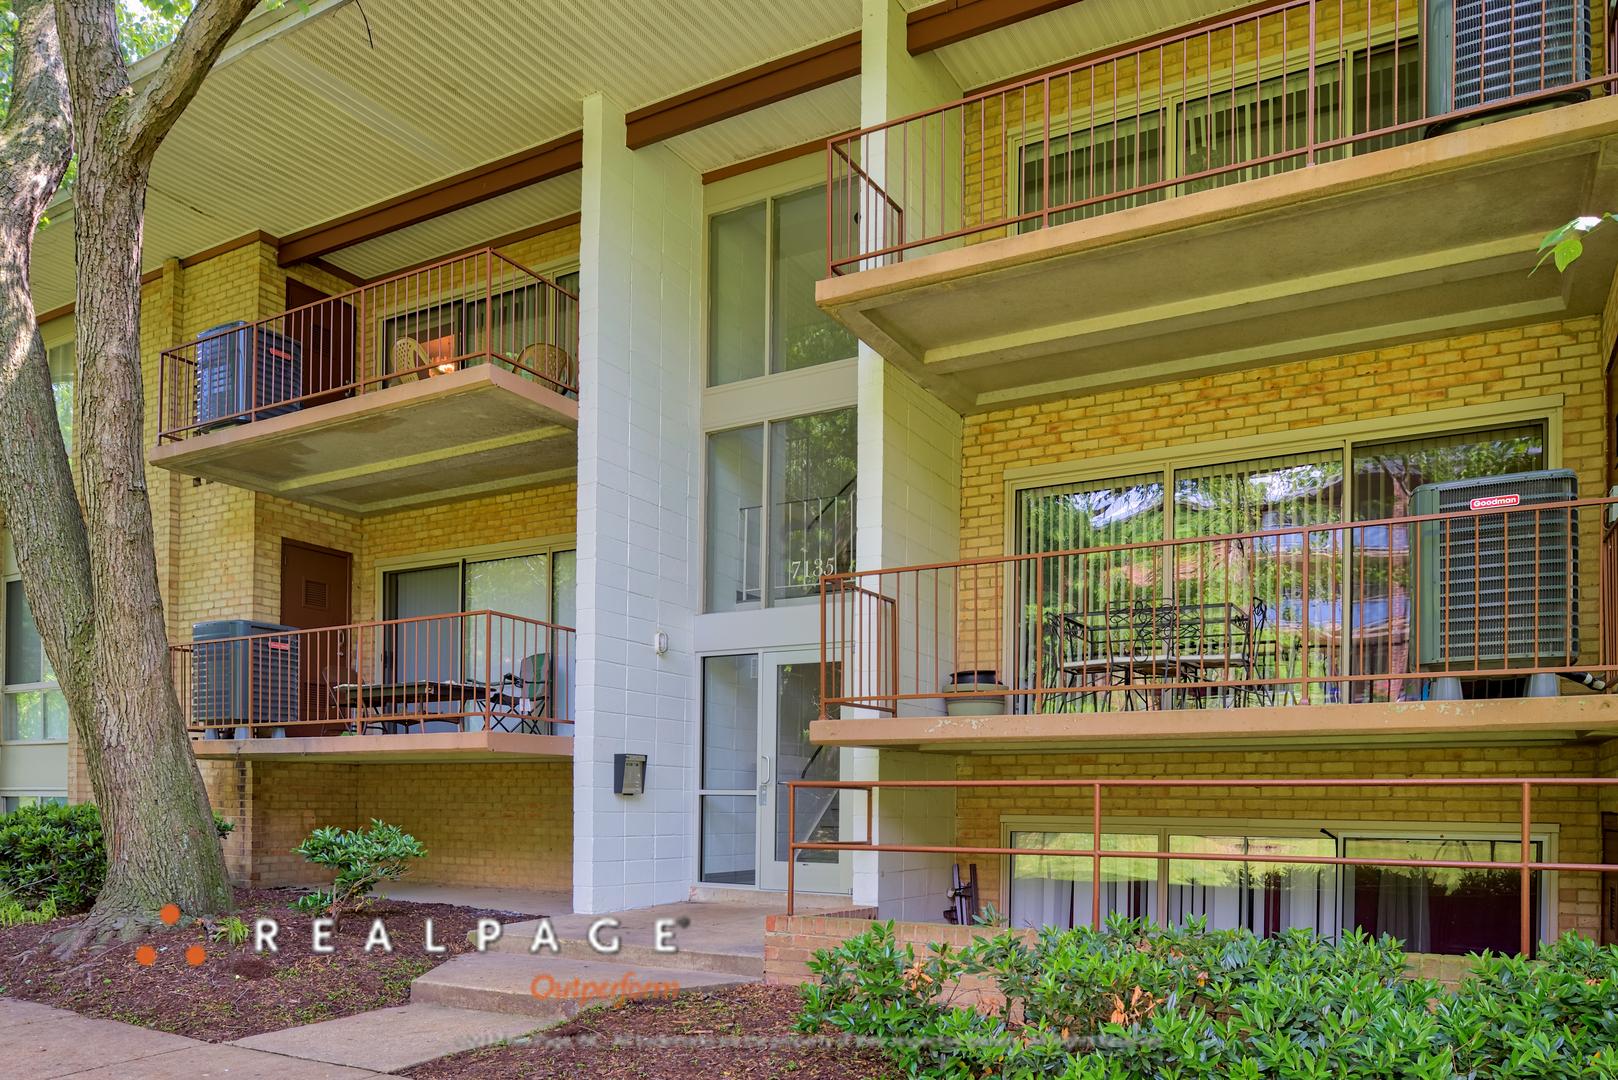 Lafayette Apartments Photo Gallery | Alexandria, VA ...